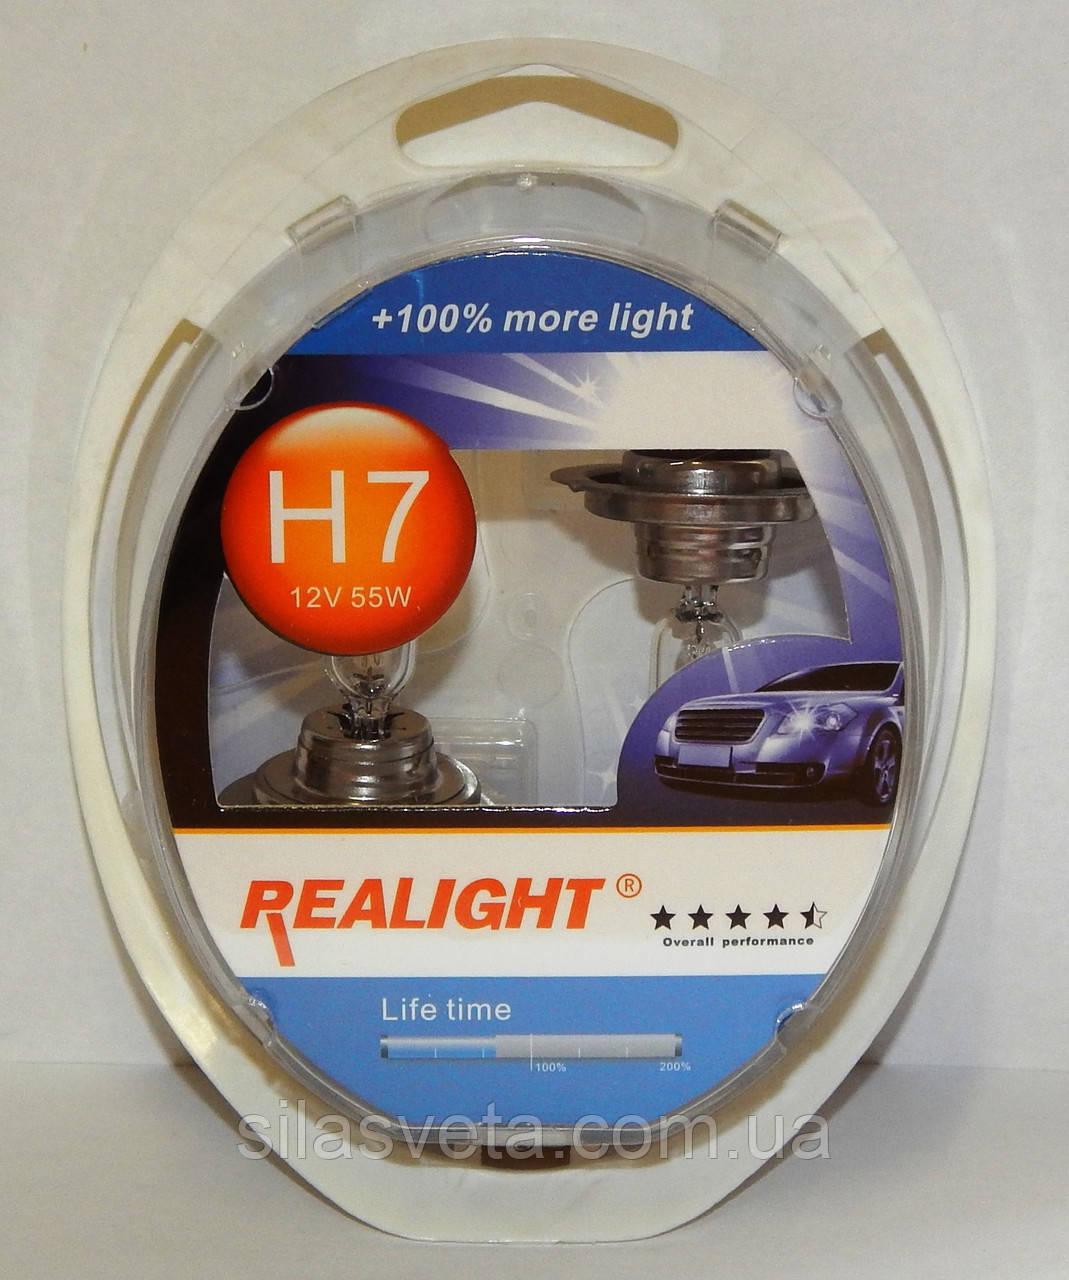 "Автомобильные галогенные лампы ""REALIGHT"" (H7)(+100%)(12V)(55W)"